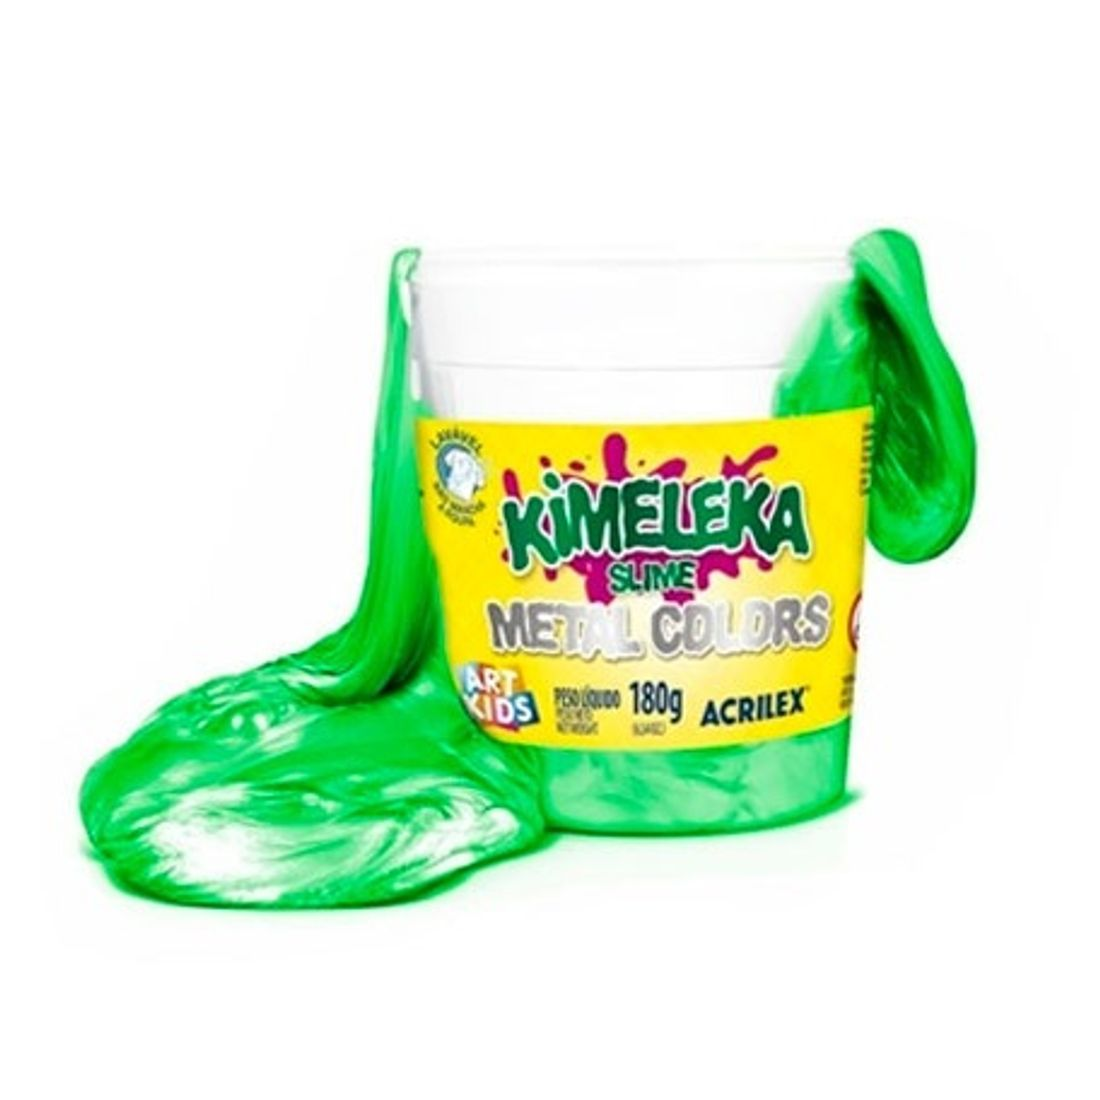 05833_670-Kimeleka-Metal-Colors-6x180g-Verde-Metalico--1-..